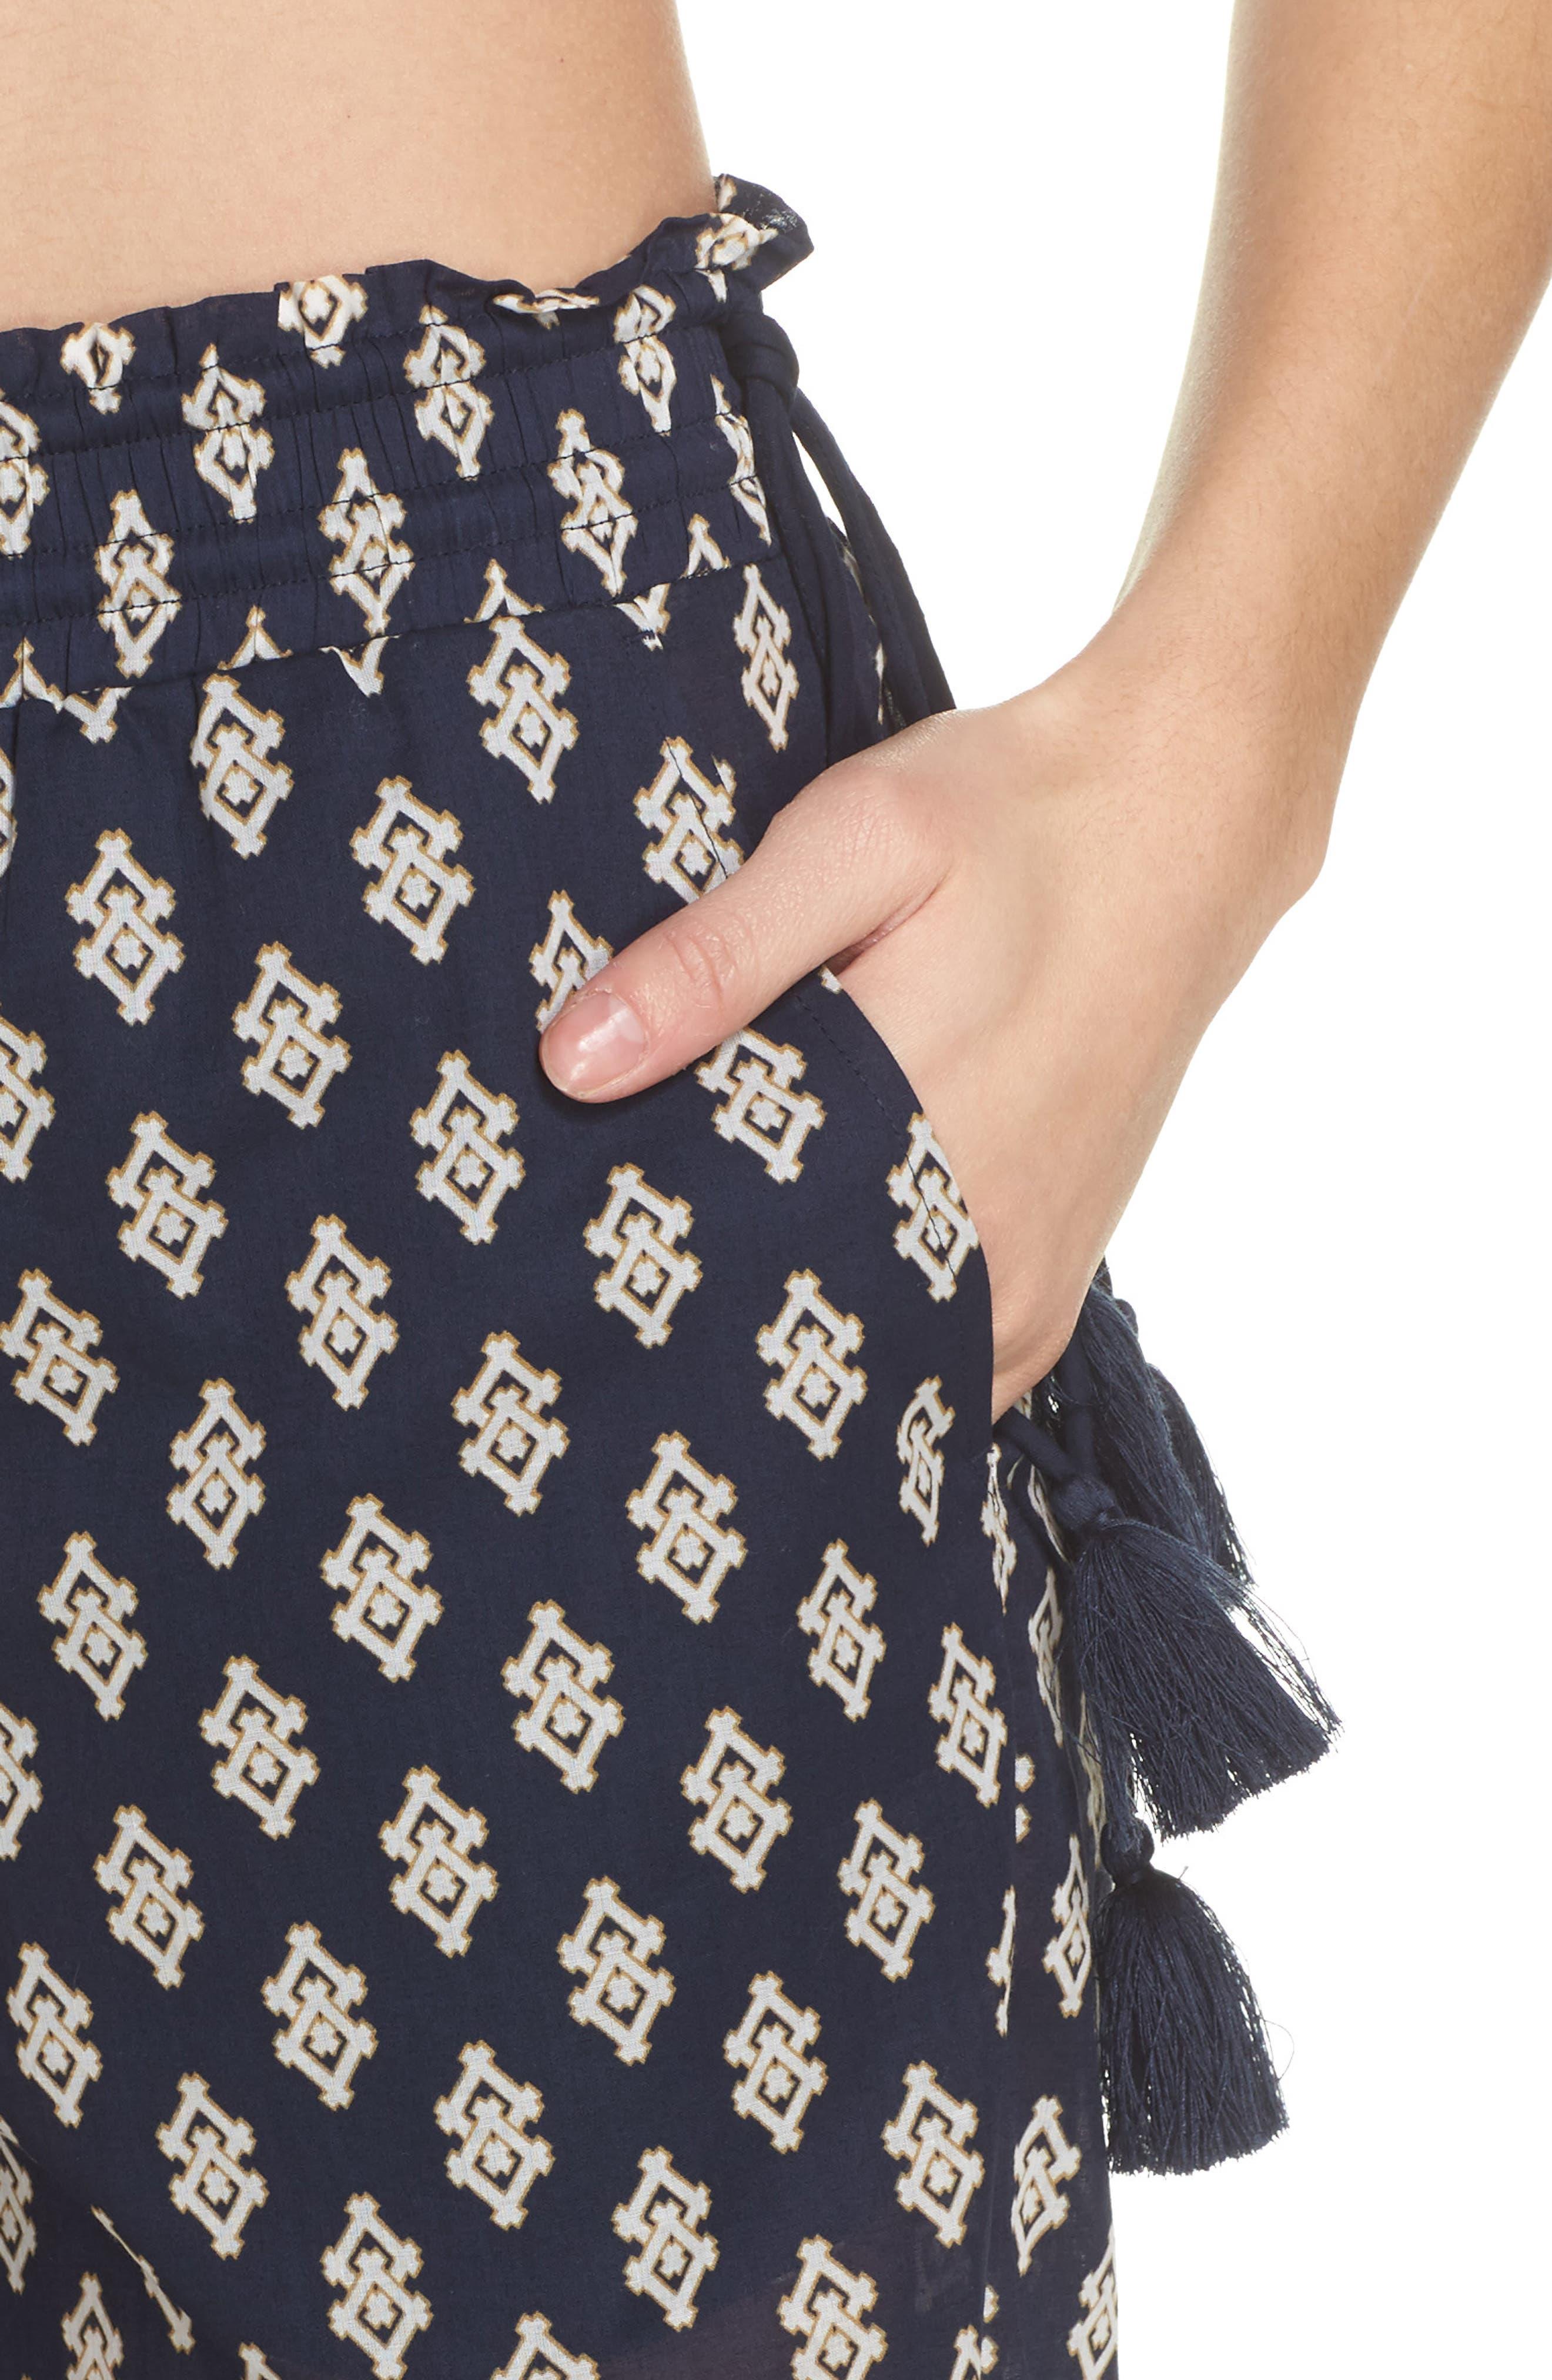 Double Diamond Cover-Up Pants,                             Alternate thumbnail 4, color,                             Tory Navy Double Diamonds